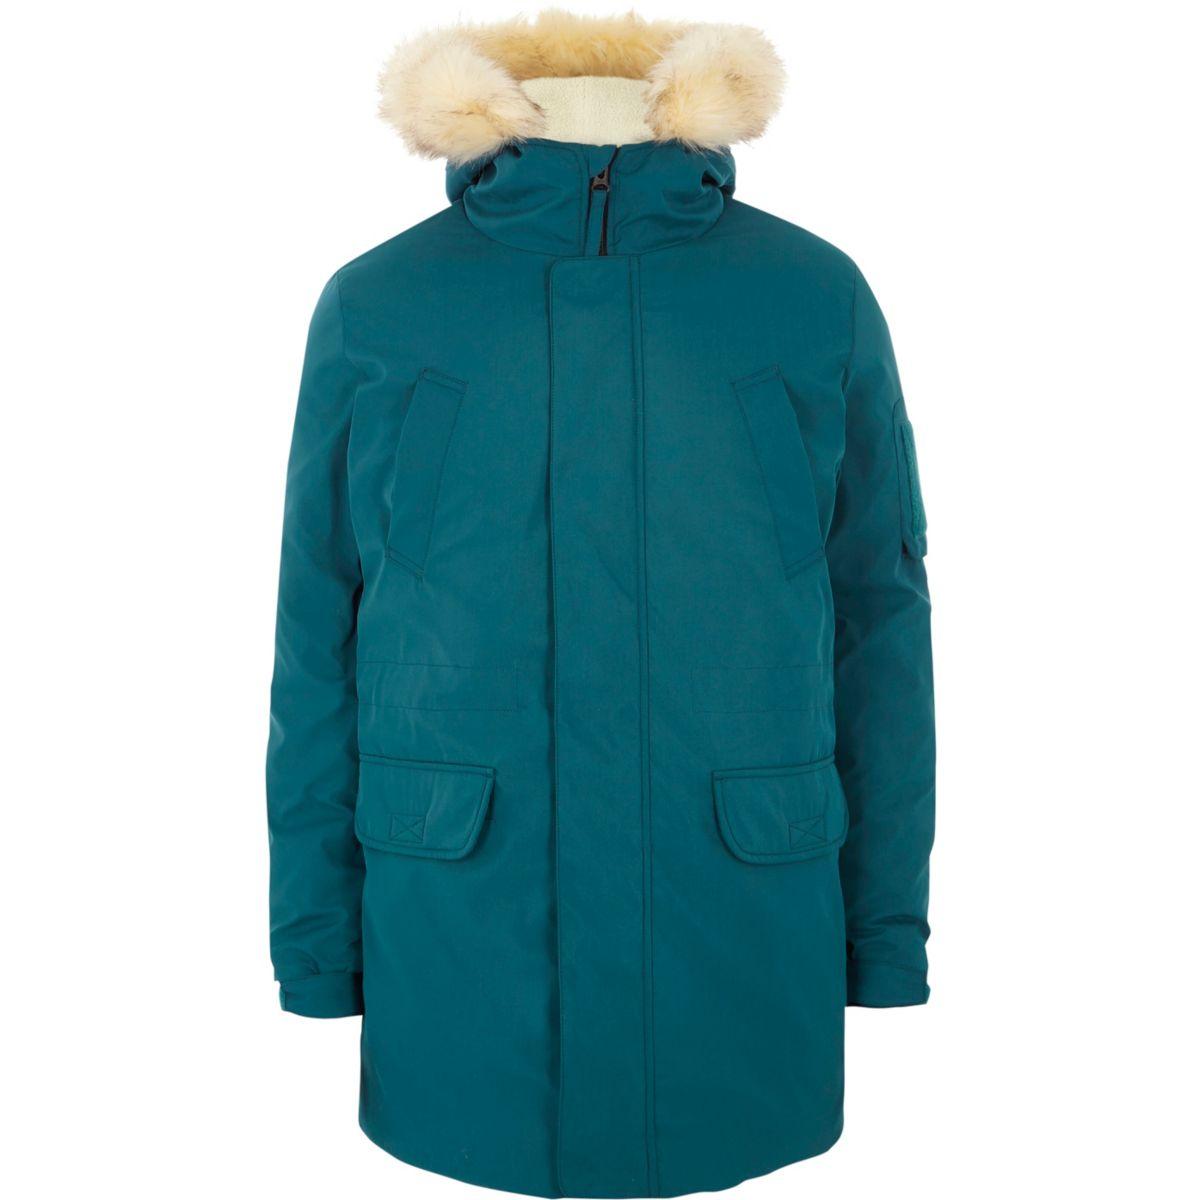 Teal blue green faux fur trim hooded parka